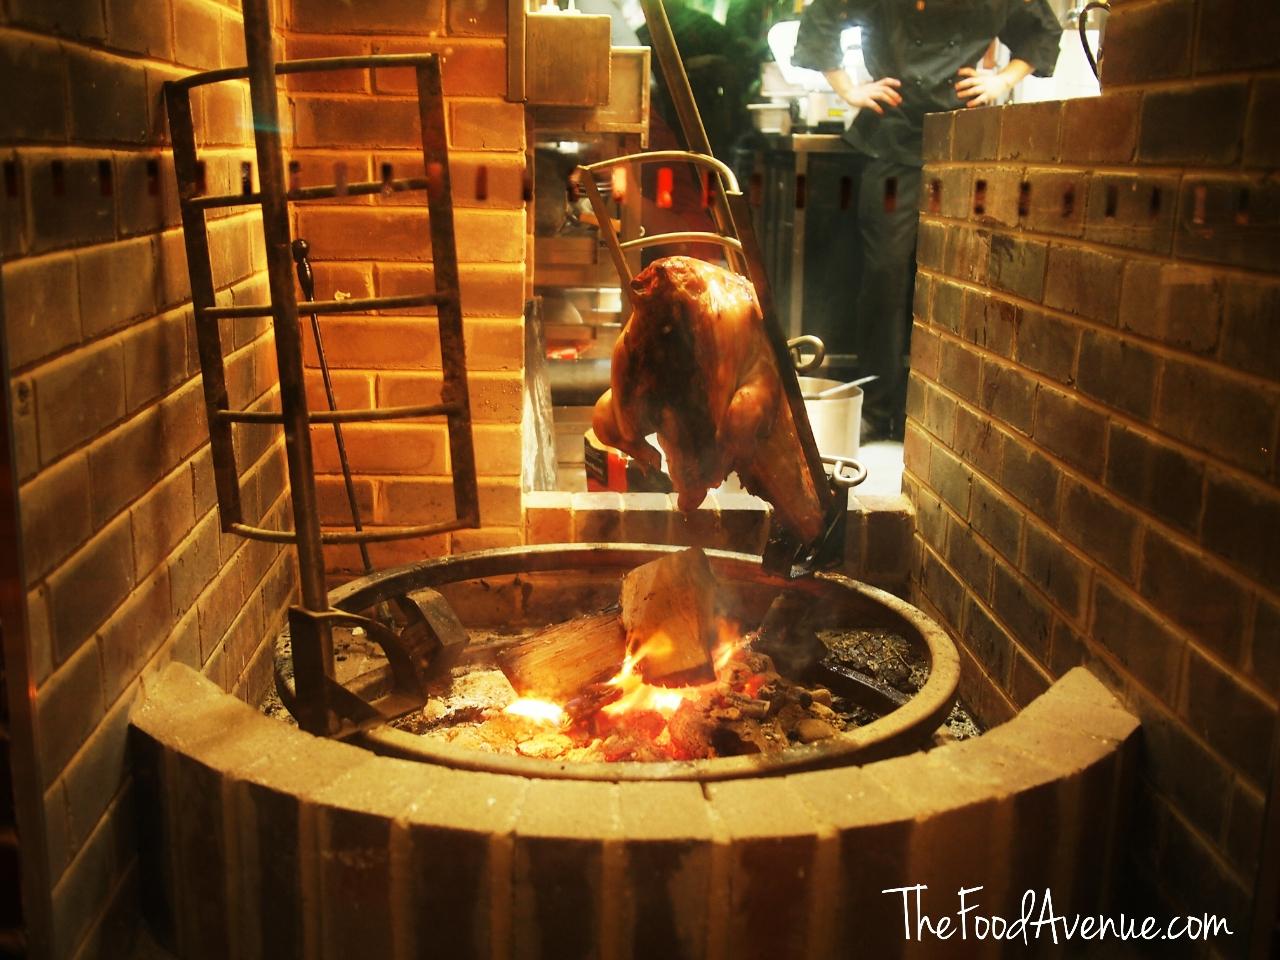 The_Food_Avenue_Black_Fire4